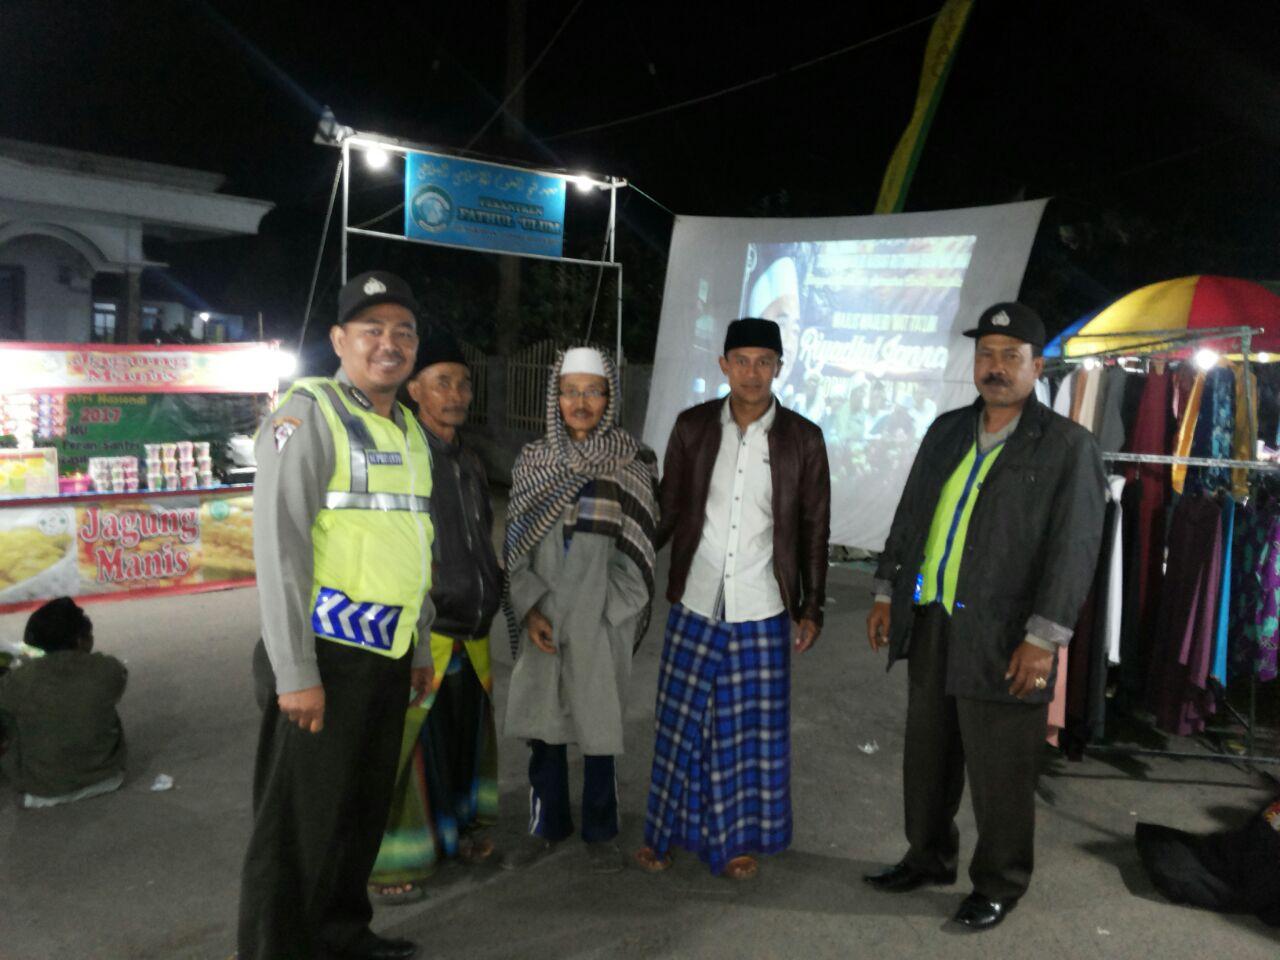 Patroli Keamanan, Anggota Polsek Pujon Polres Batu Giatkan Pengamanan Pengajian Riyadlul Jannah Di Wilayah Binaan